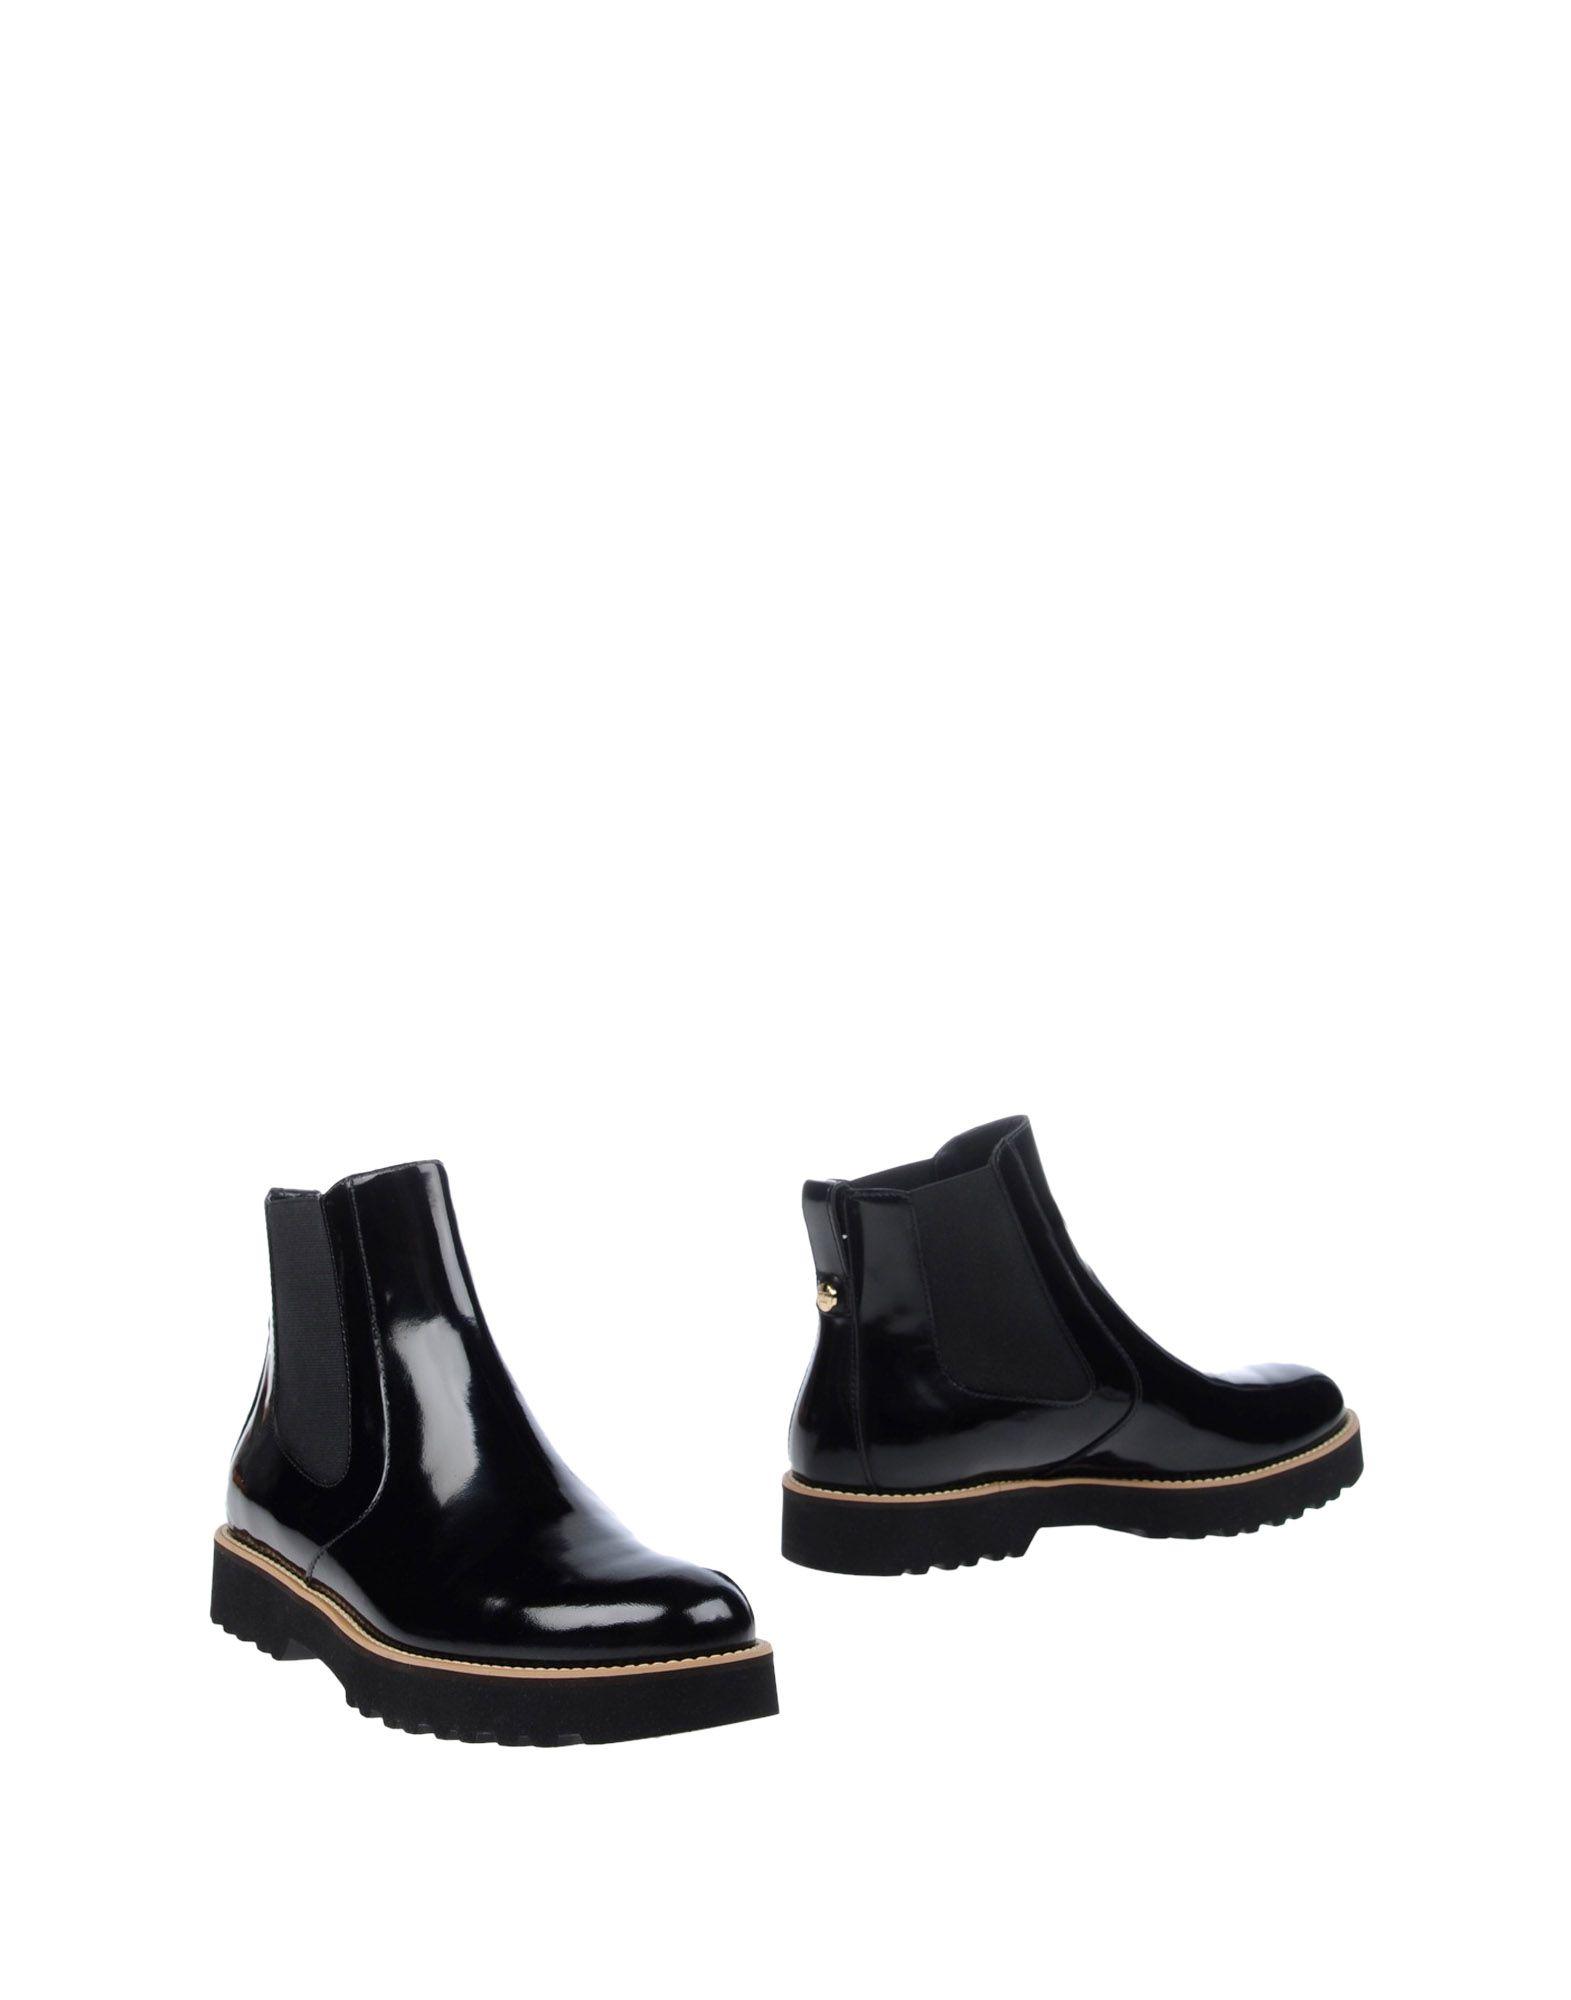 Hogan Chelsea Boots Damen  11272038VKGut aussehende strapazierfähige Schuhe